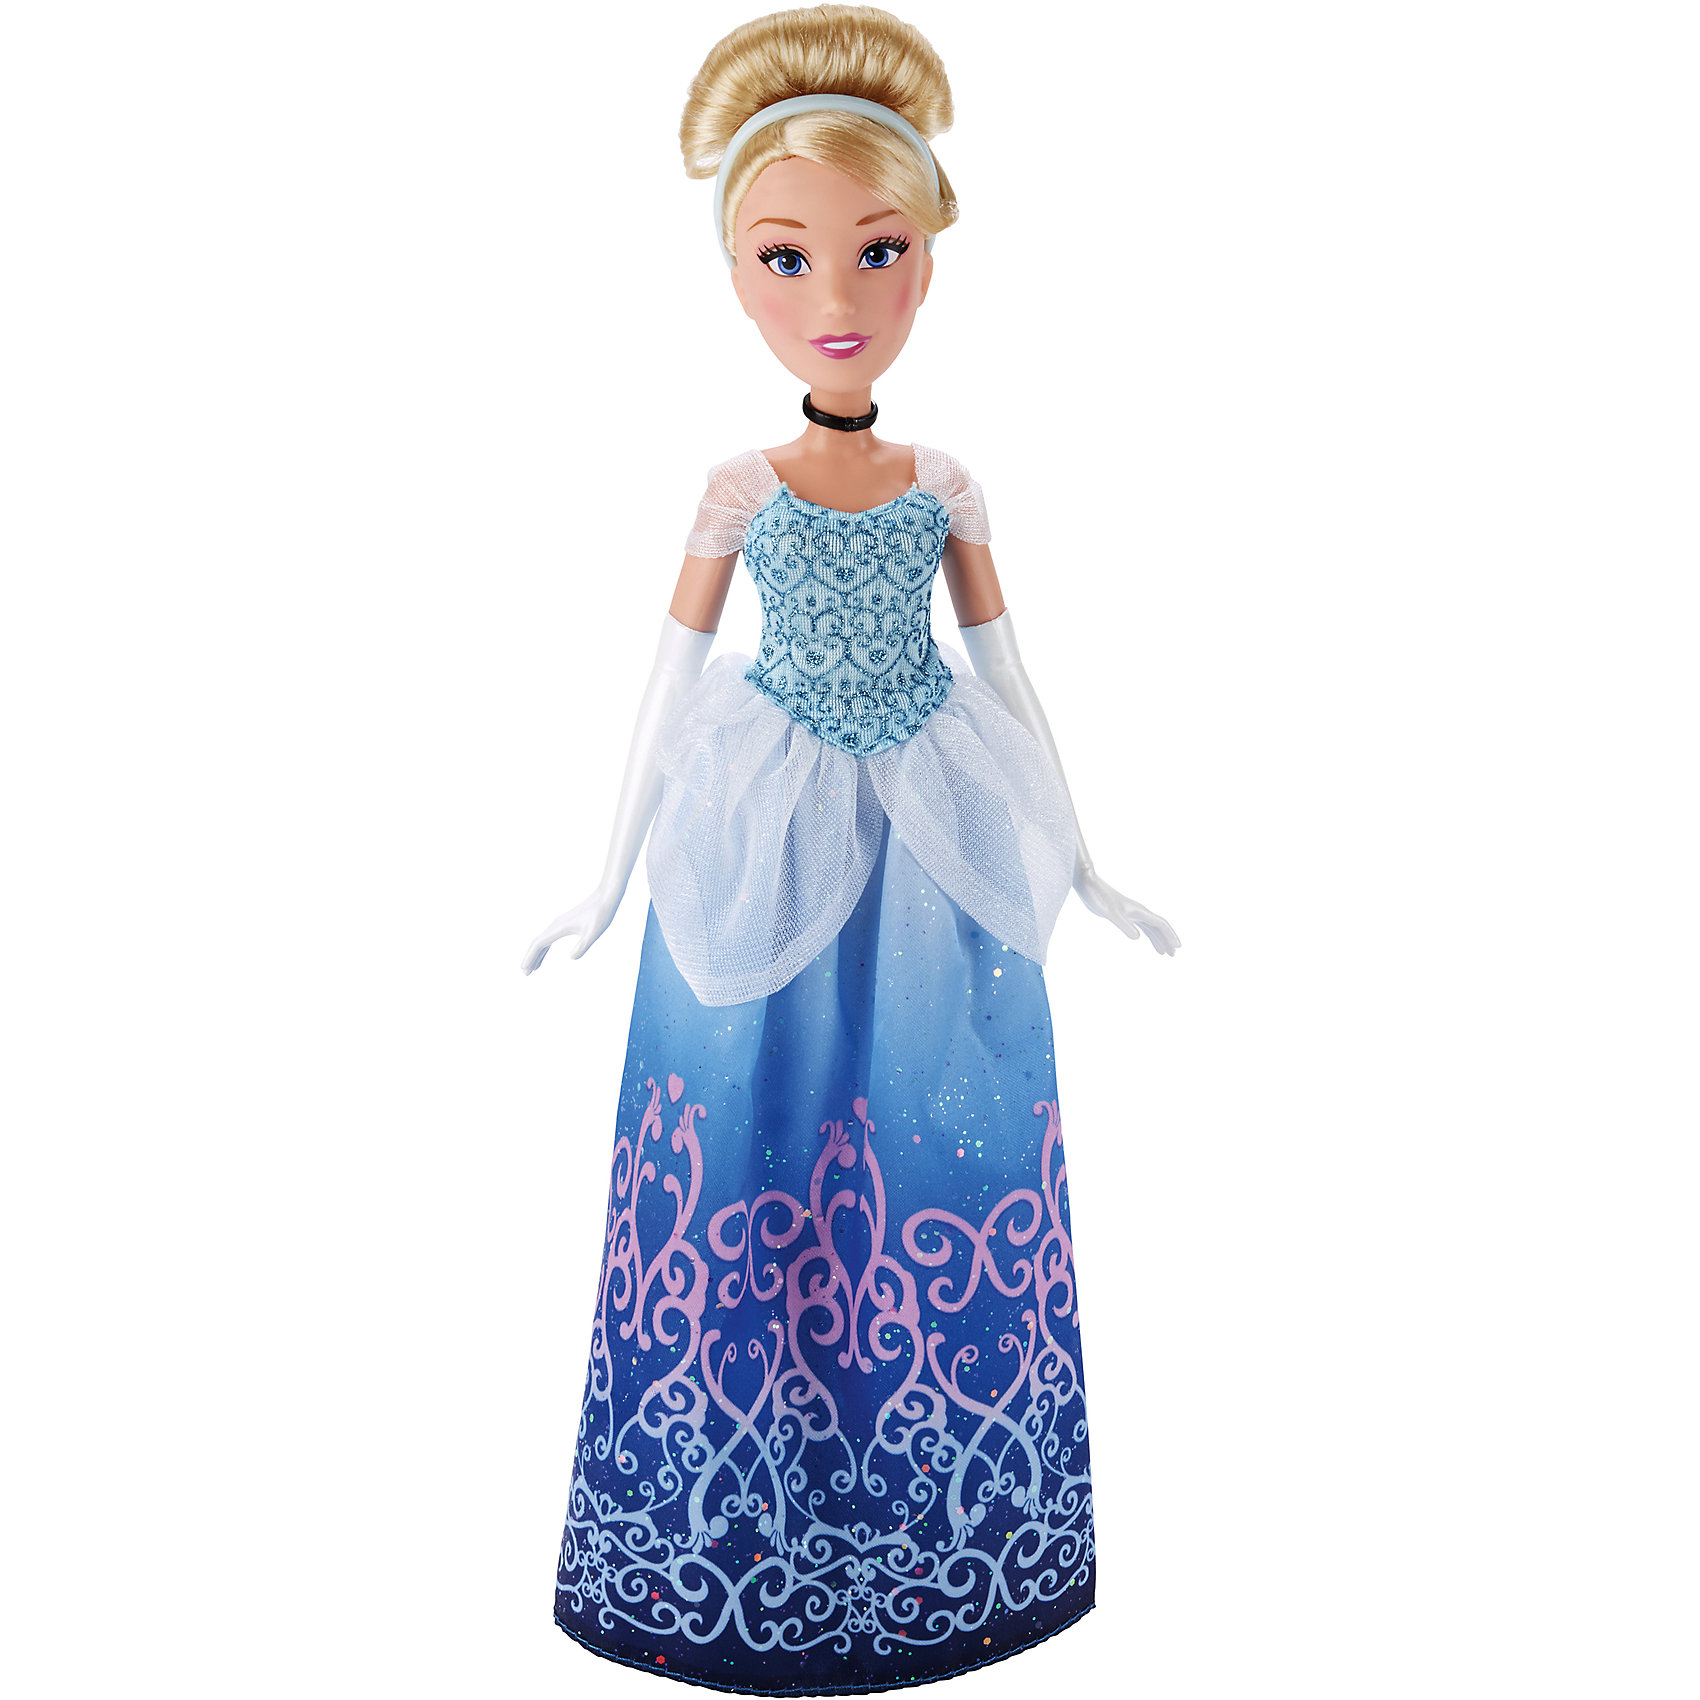 Hasbro Кукла Золушка, Принцессы Дисней hasbro кукла золушка с проявляющимся принтом